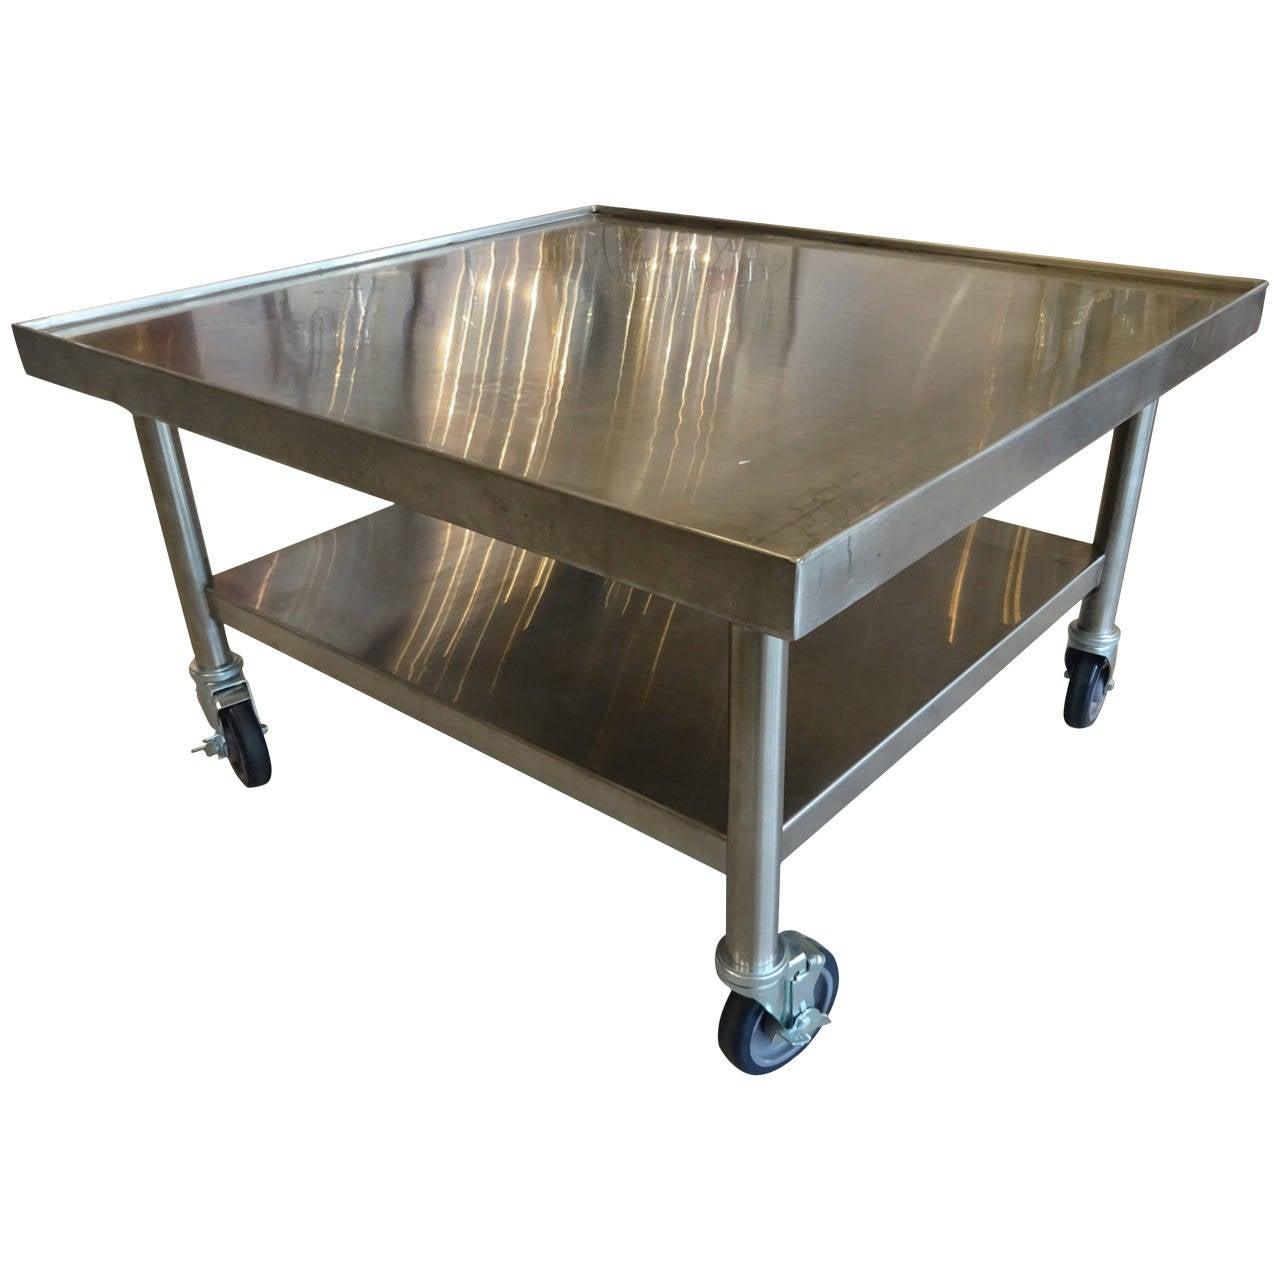 industrial rolling cocktail table at 1stdibs. Black Bedroom Furniture Sets. Home Design Ideas